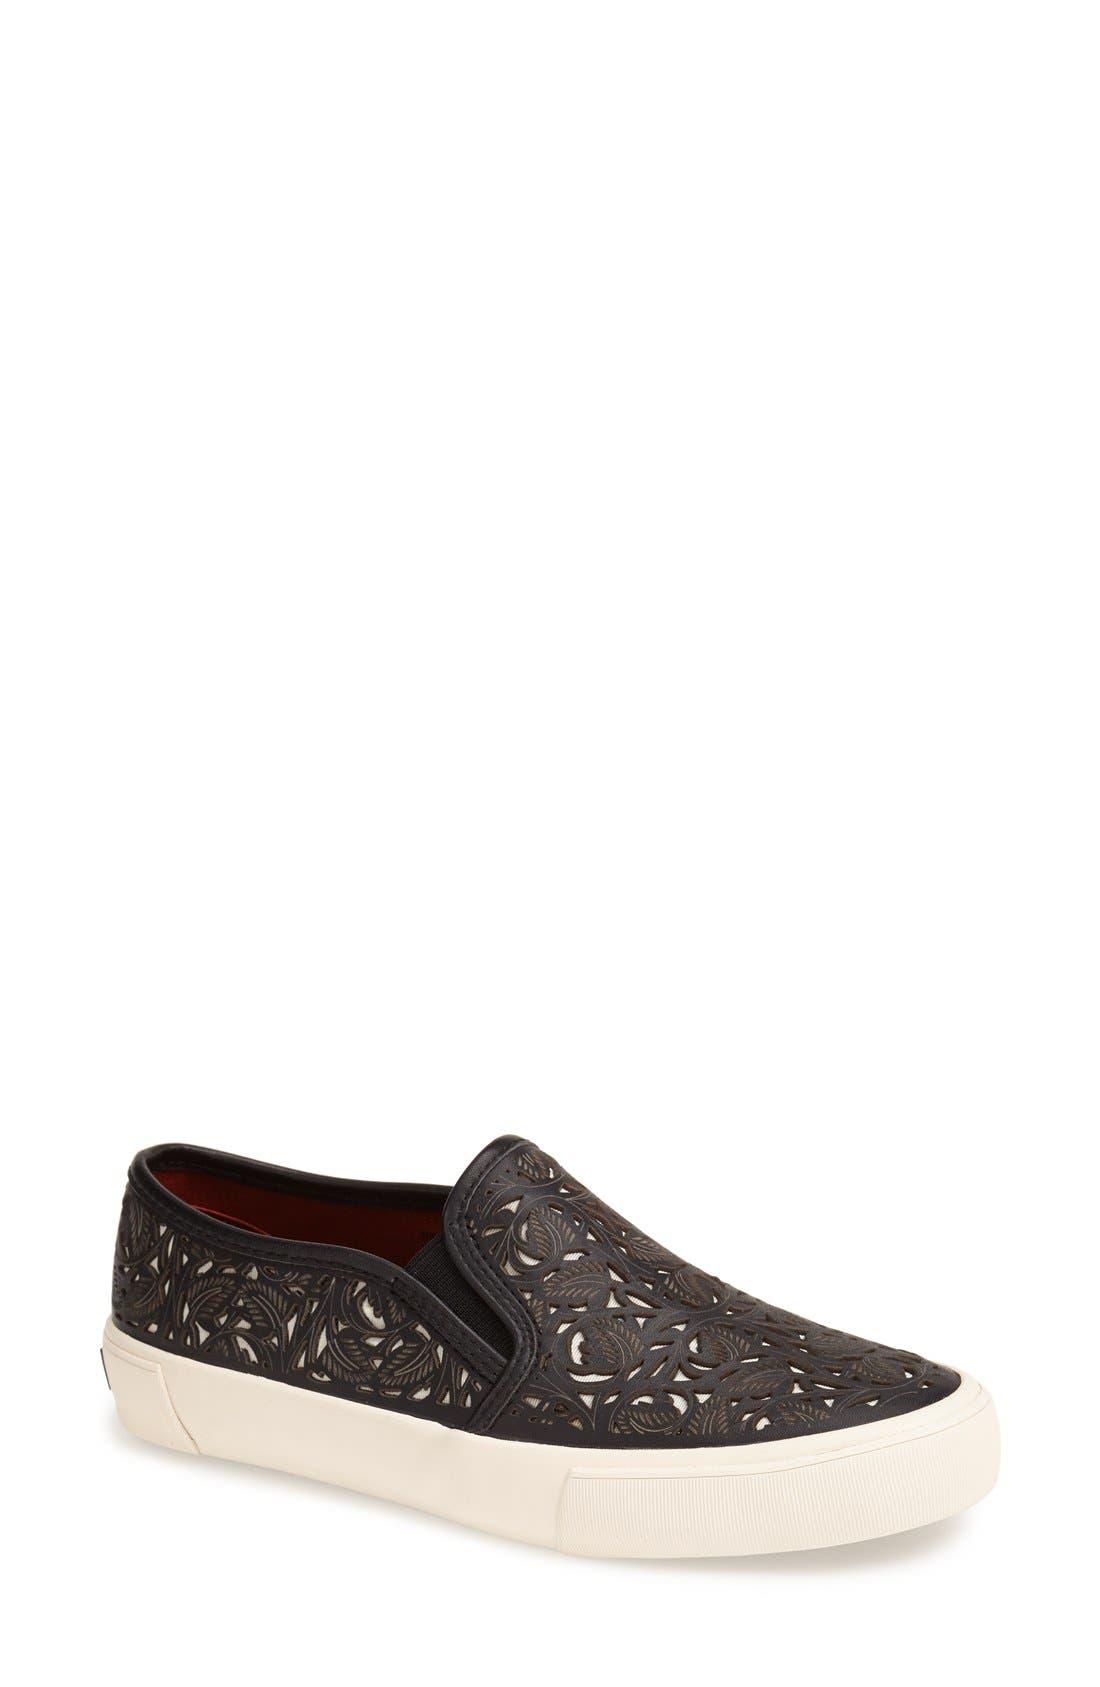 AERIN 'Marsden' Perforated Slip-On Sneaker, Main, color, 001